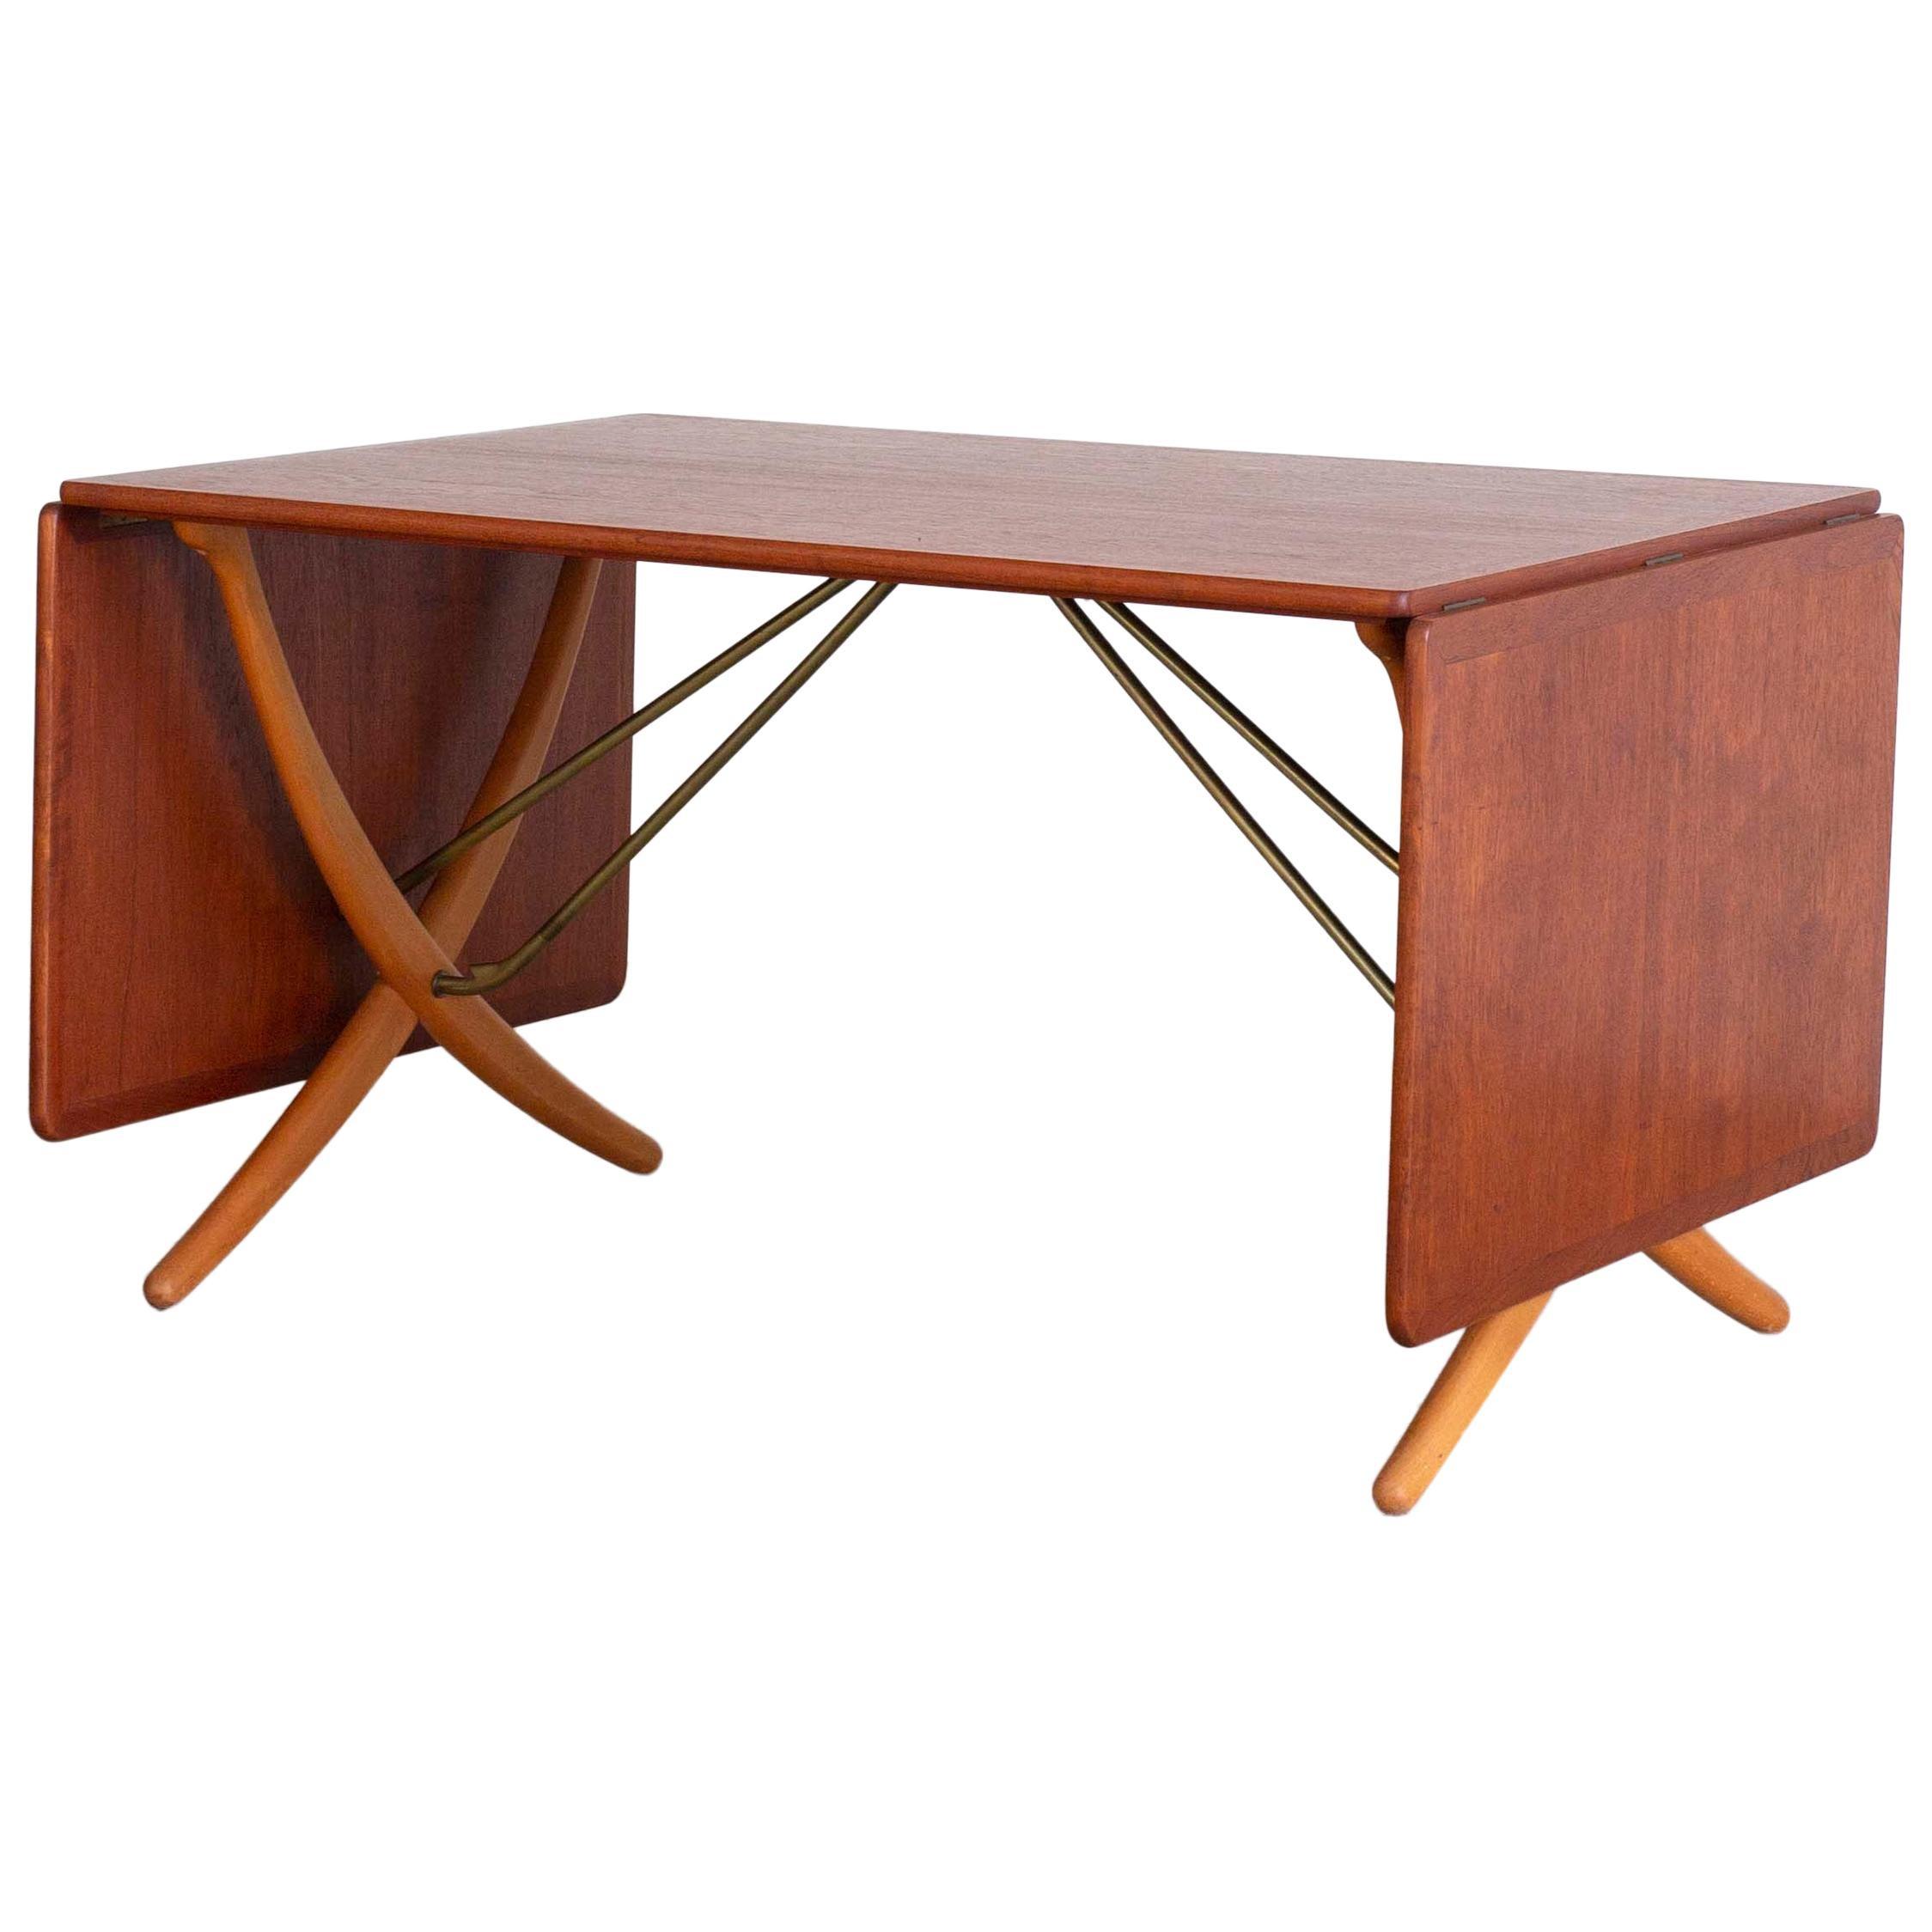 Hans J. Wegner Sabre Leg Table Model AT-304 for Andreas Tuck